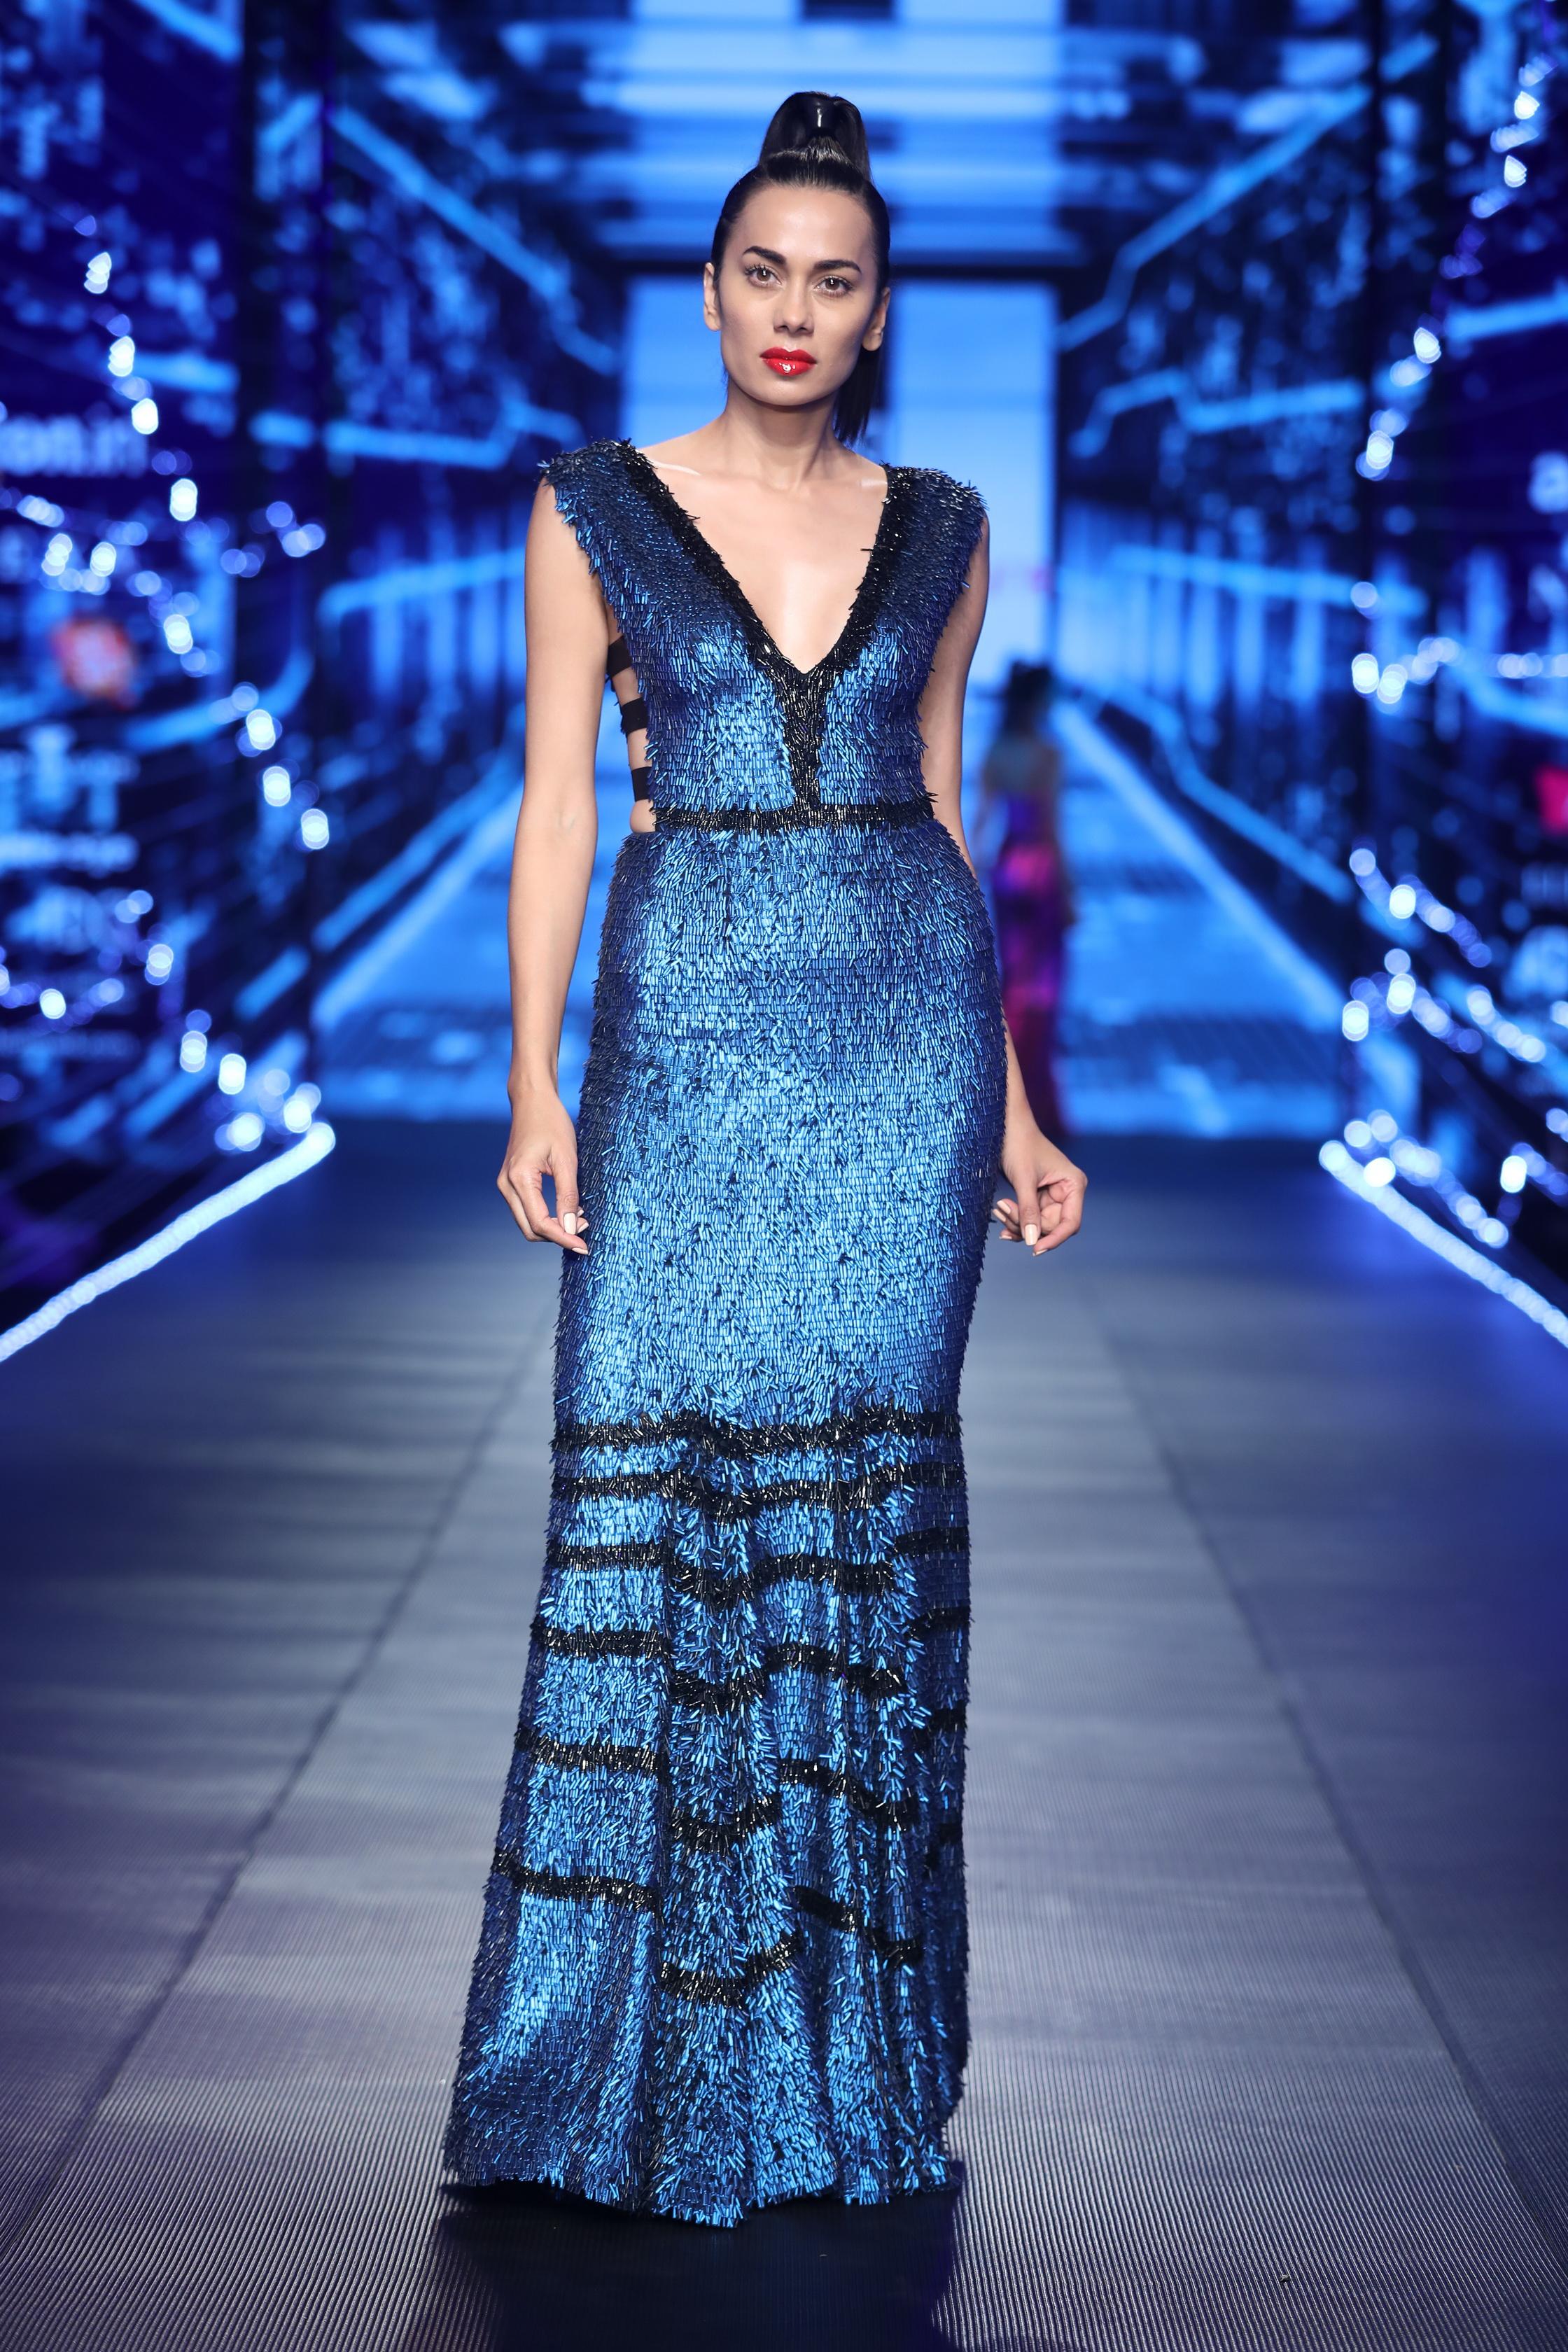 Namrata Joshipura at FDCI Amazon India Fashion Week Autumn Winter 2018